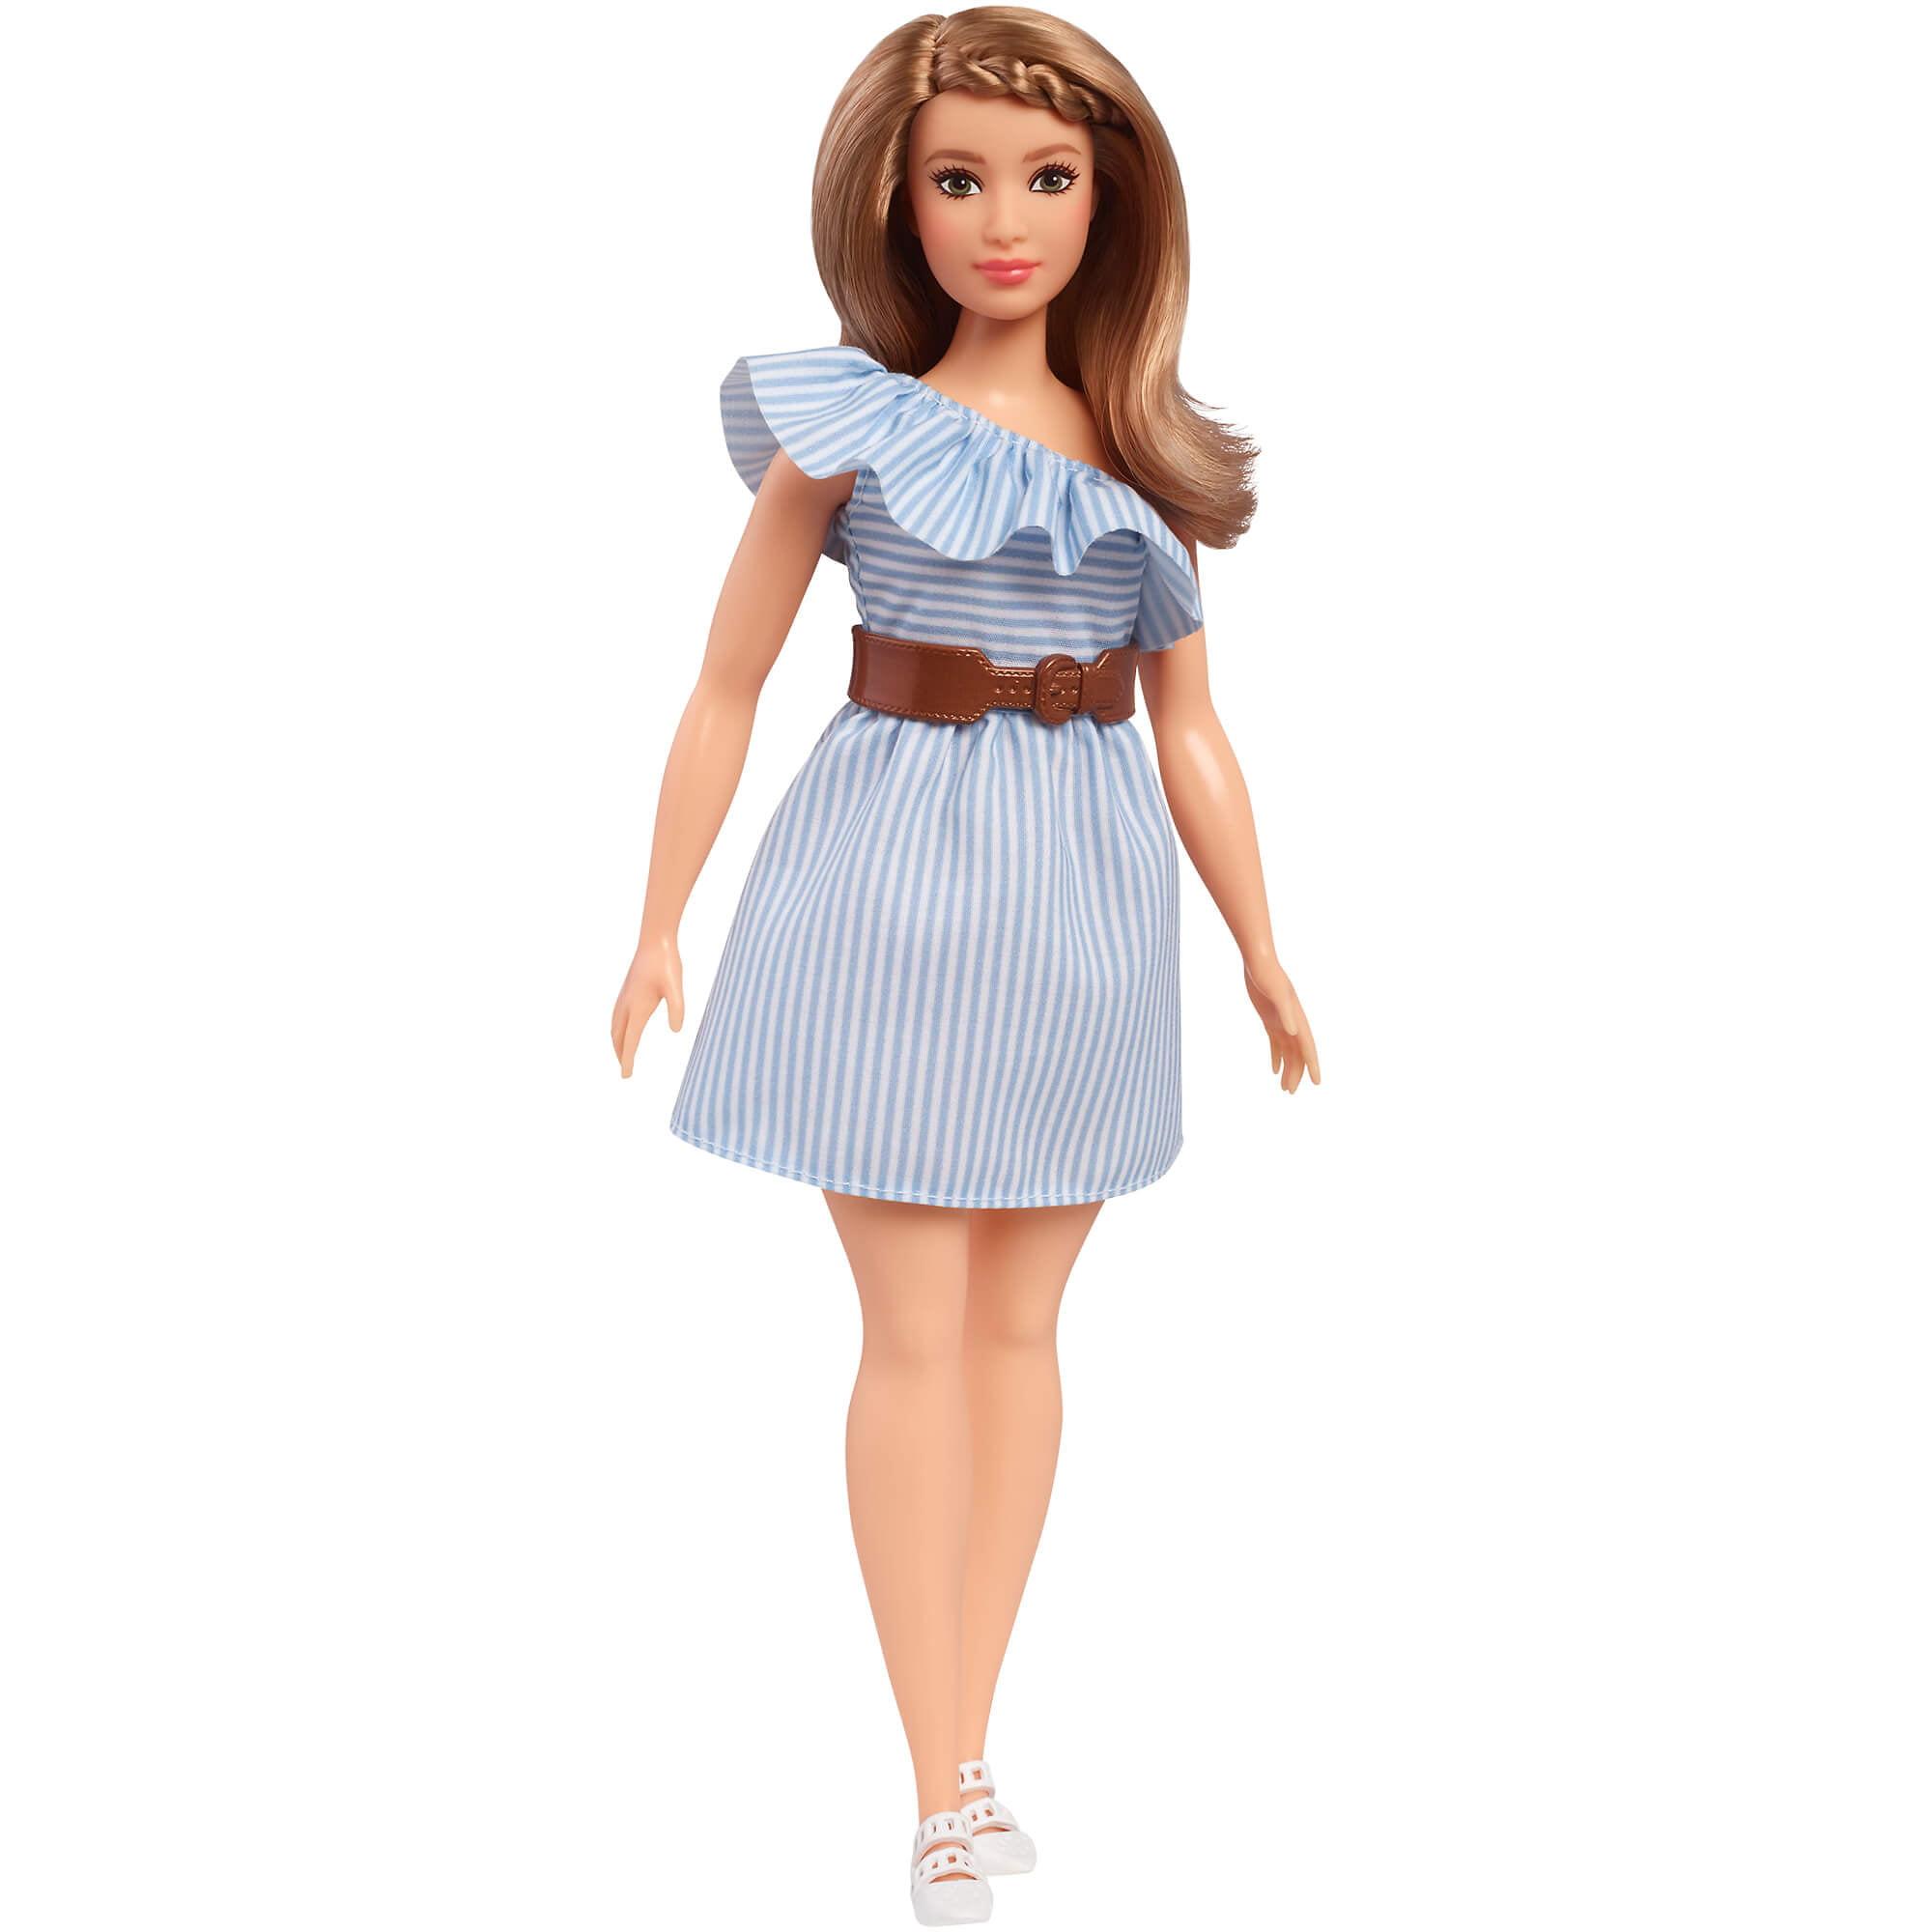 Barbie Fashionistas Doll, Curvy with Pinstripe One-Shoulder Dress